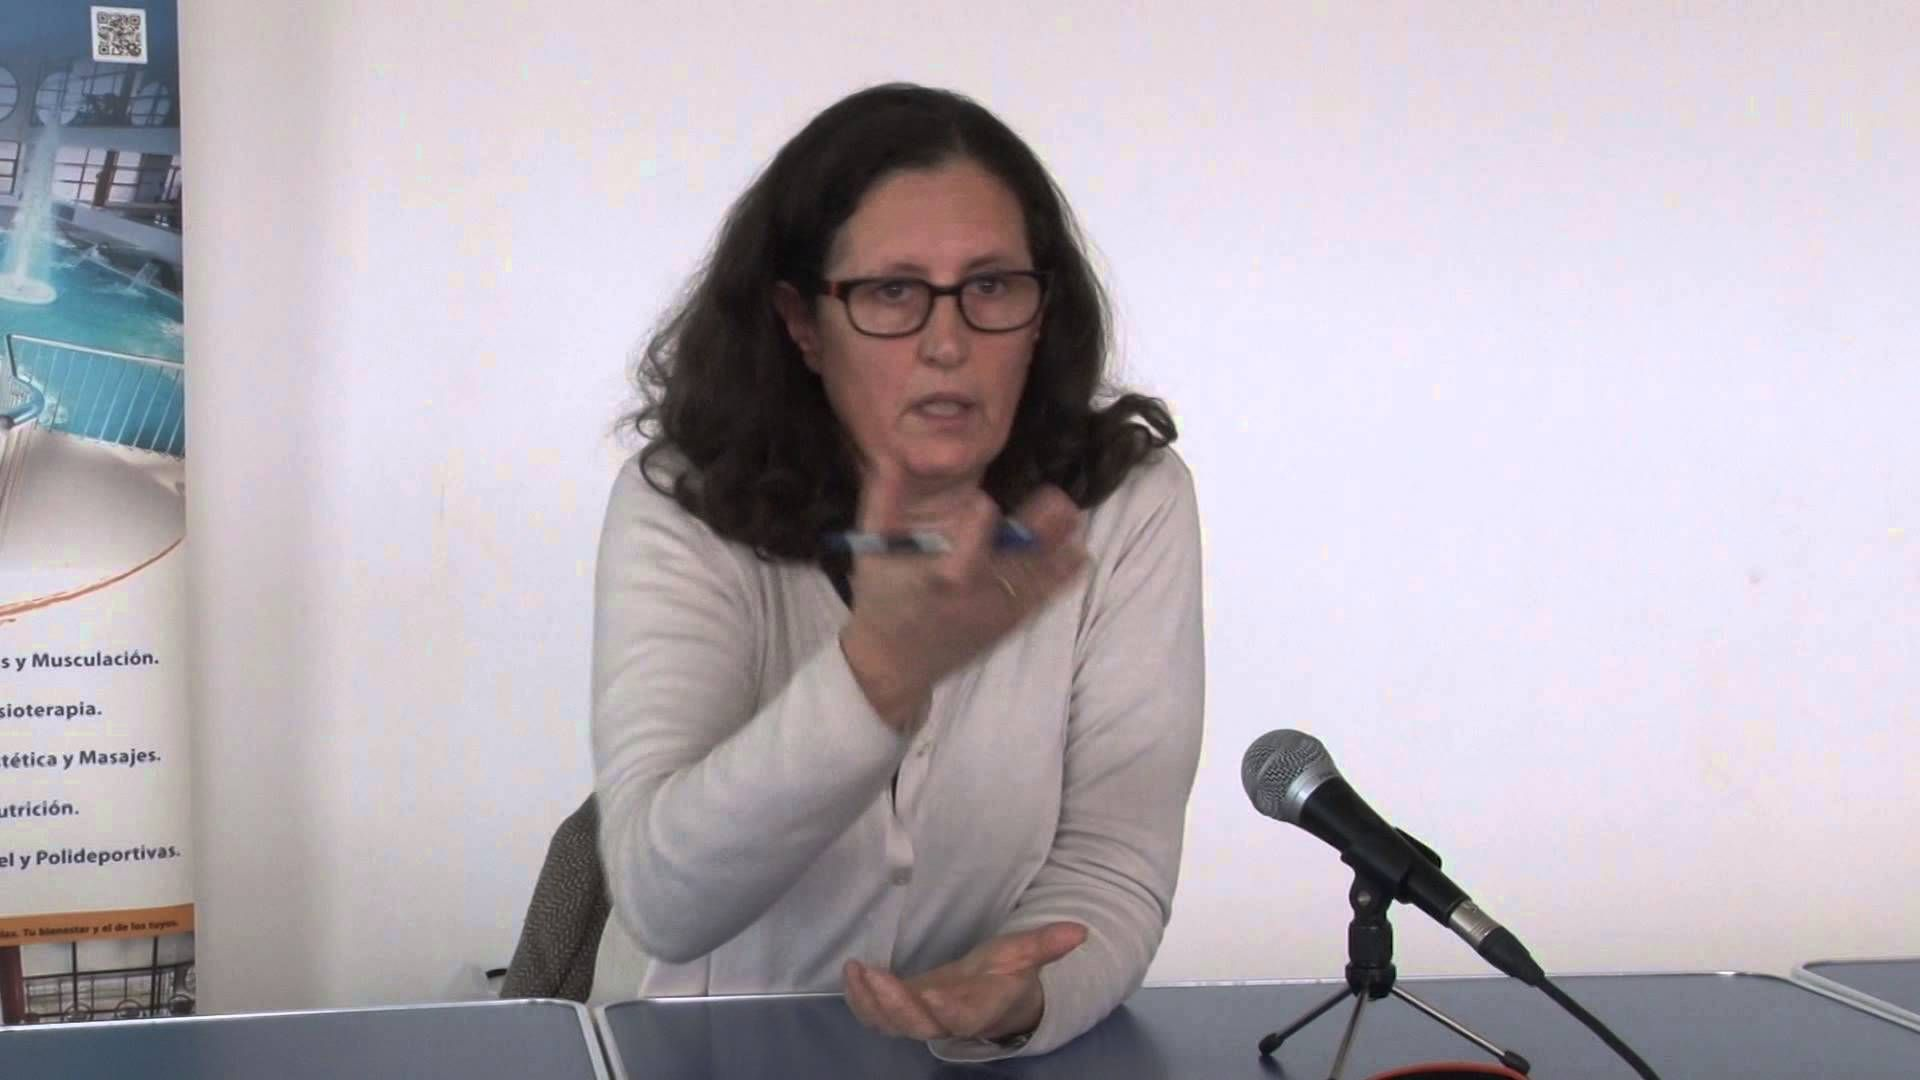 Semana Saludable: Conferencia sobre Alzheimer (Cascante 2015)